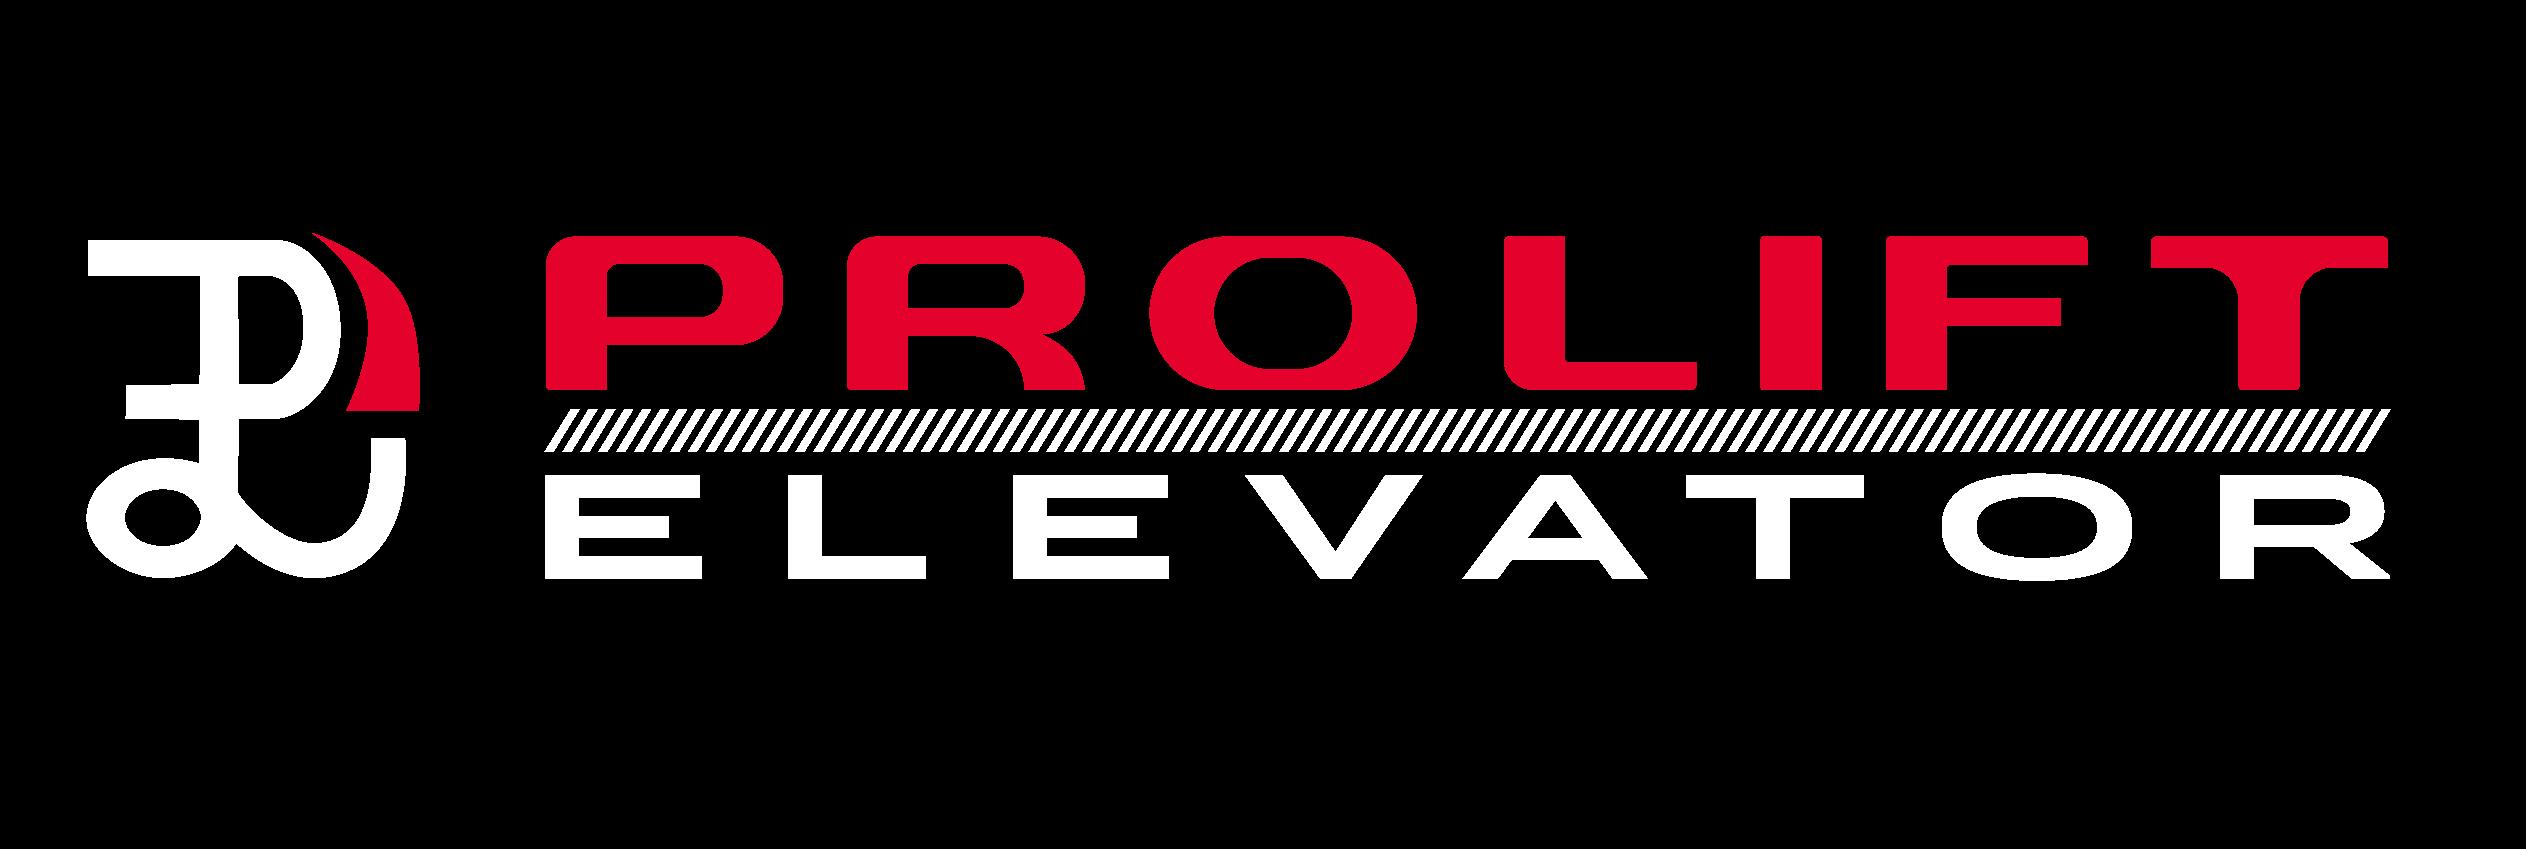 Prolift Elevator